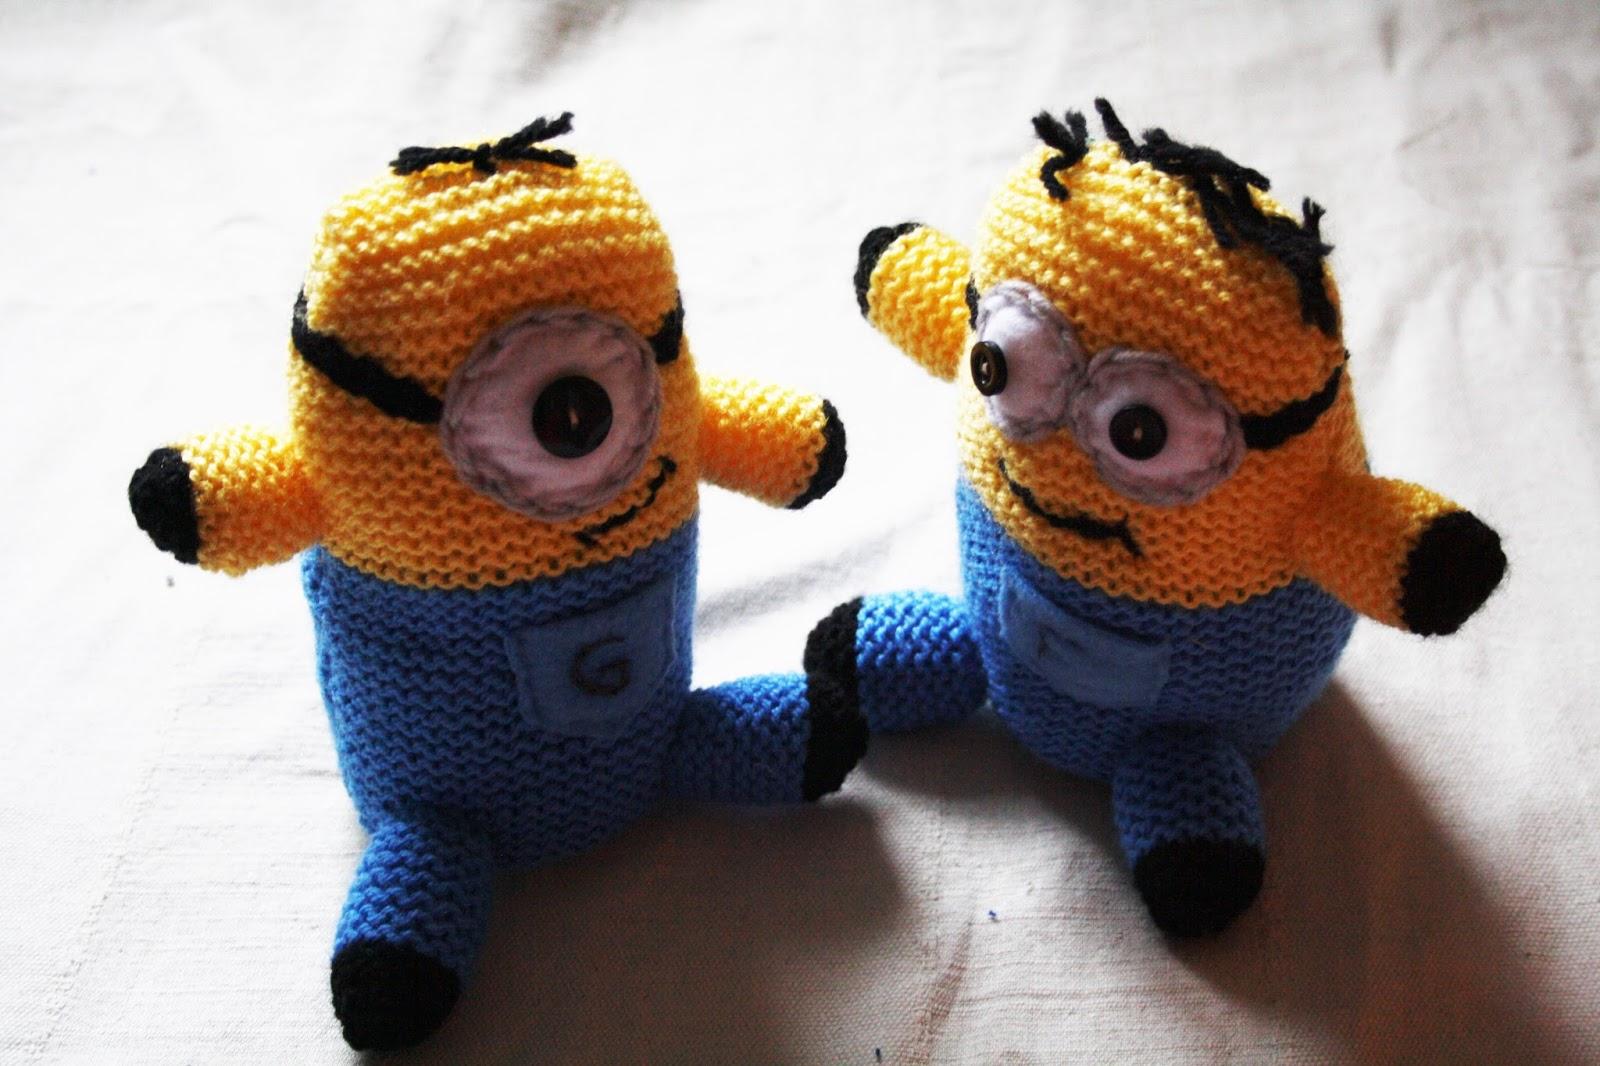 Knitting Pattern Minion Toy : KnitWitsOwls: Smaller Knitted Minions